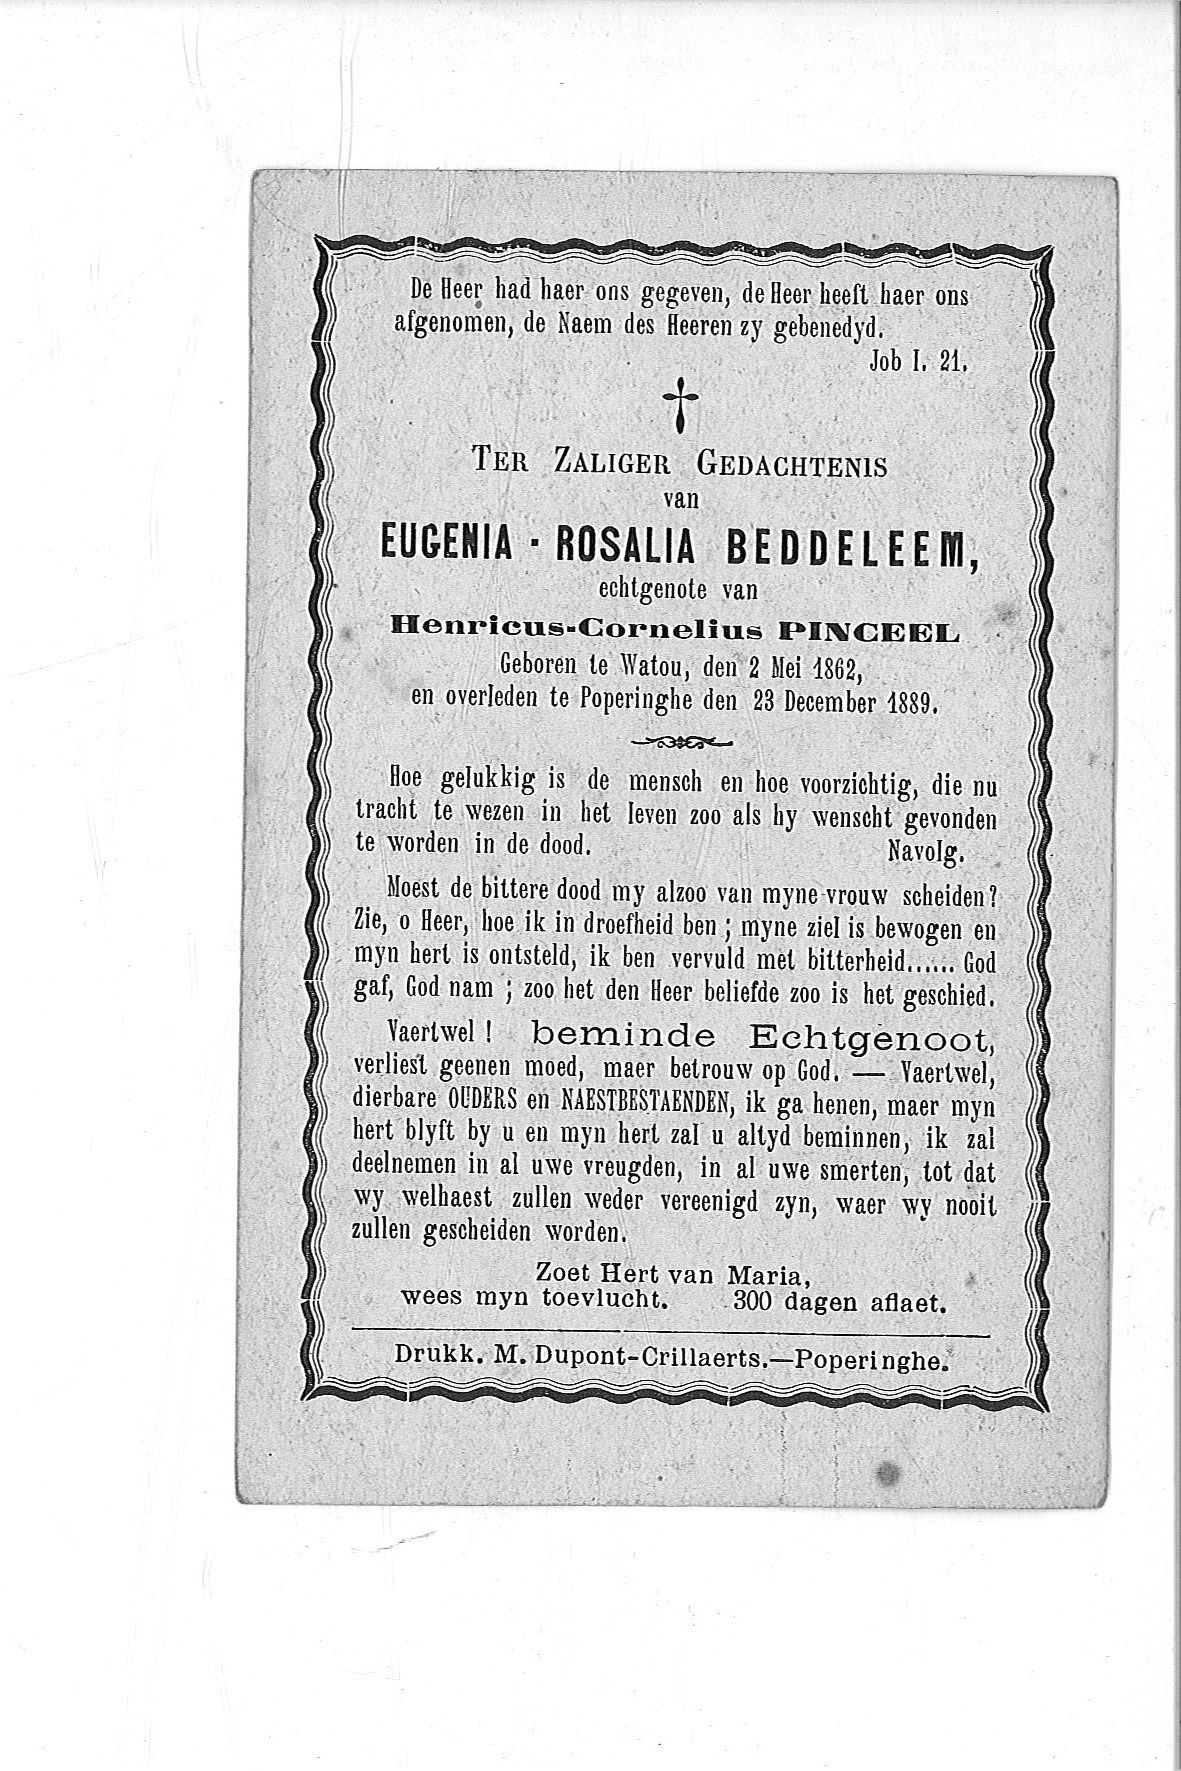 Eugenia-Rosalia(1889)20090813090145_00053.jpg